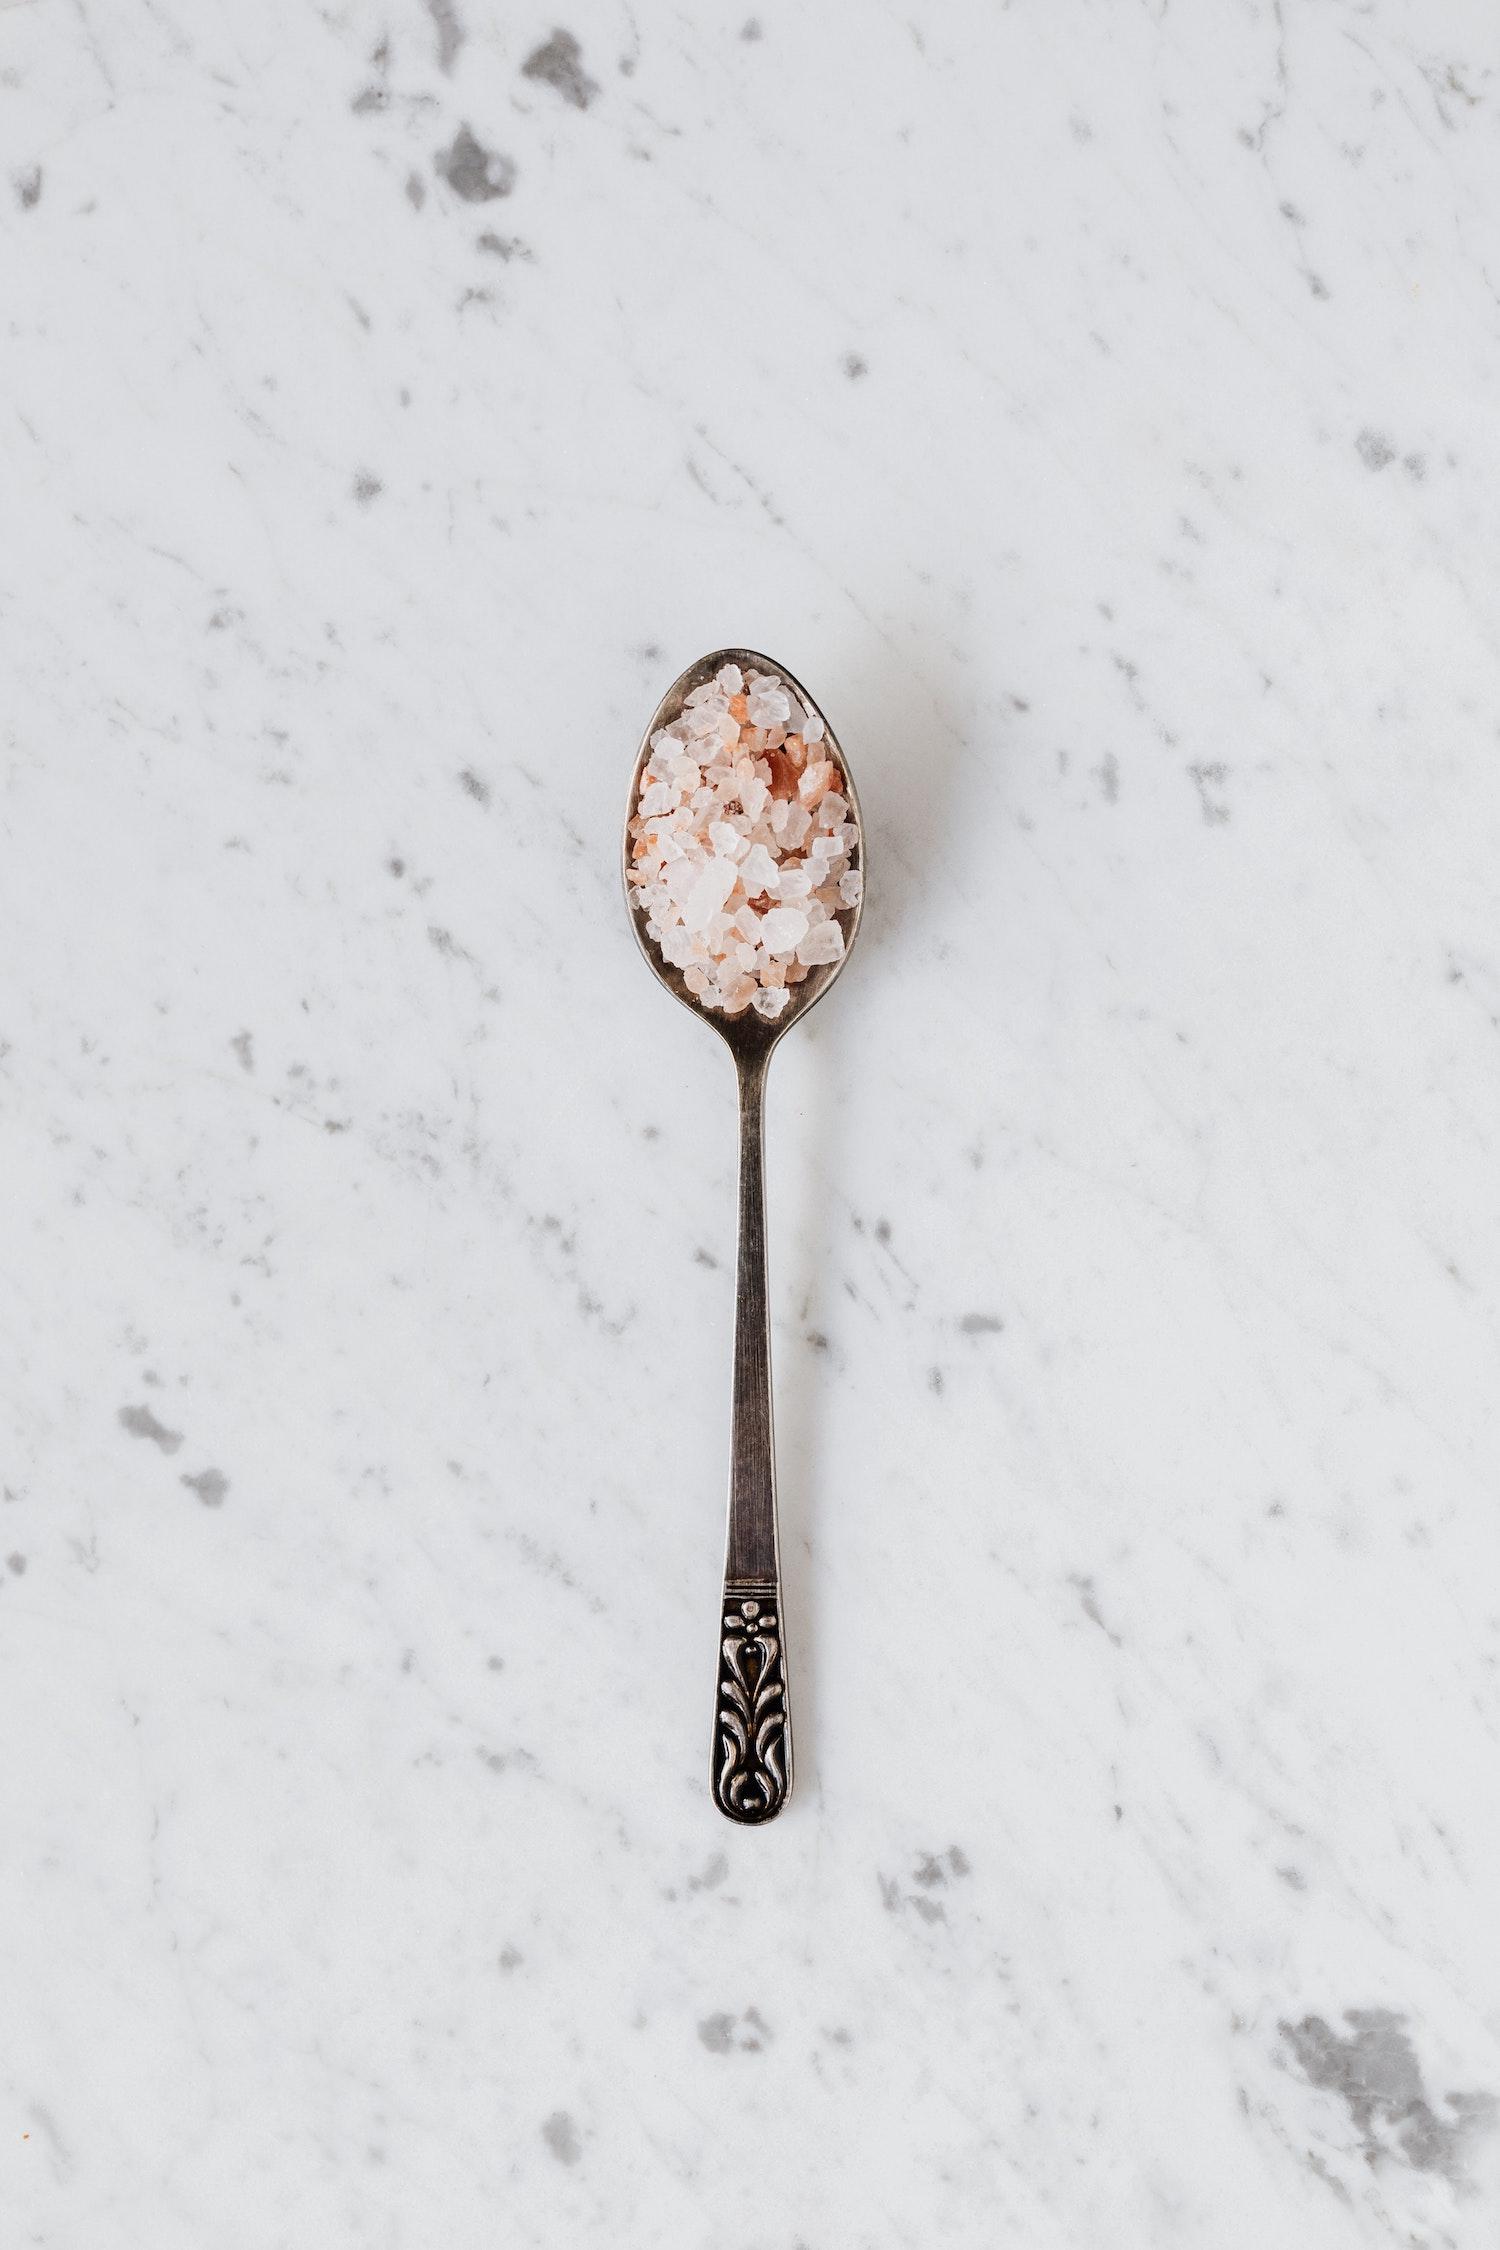 Spoonful of Pink Salt